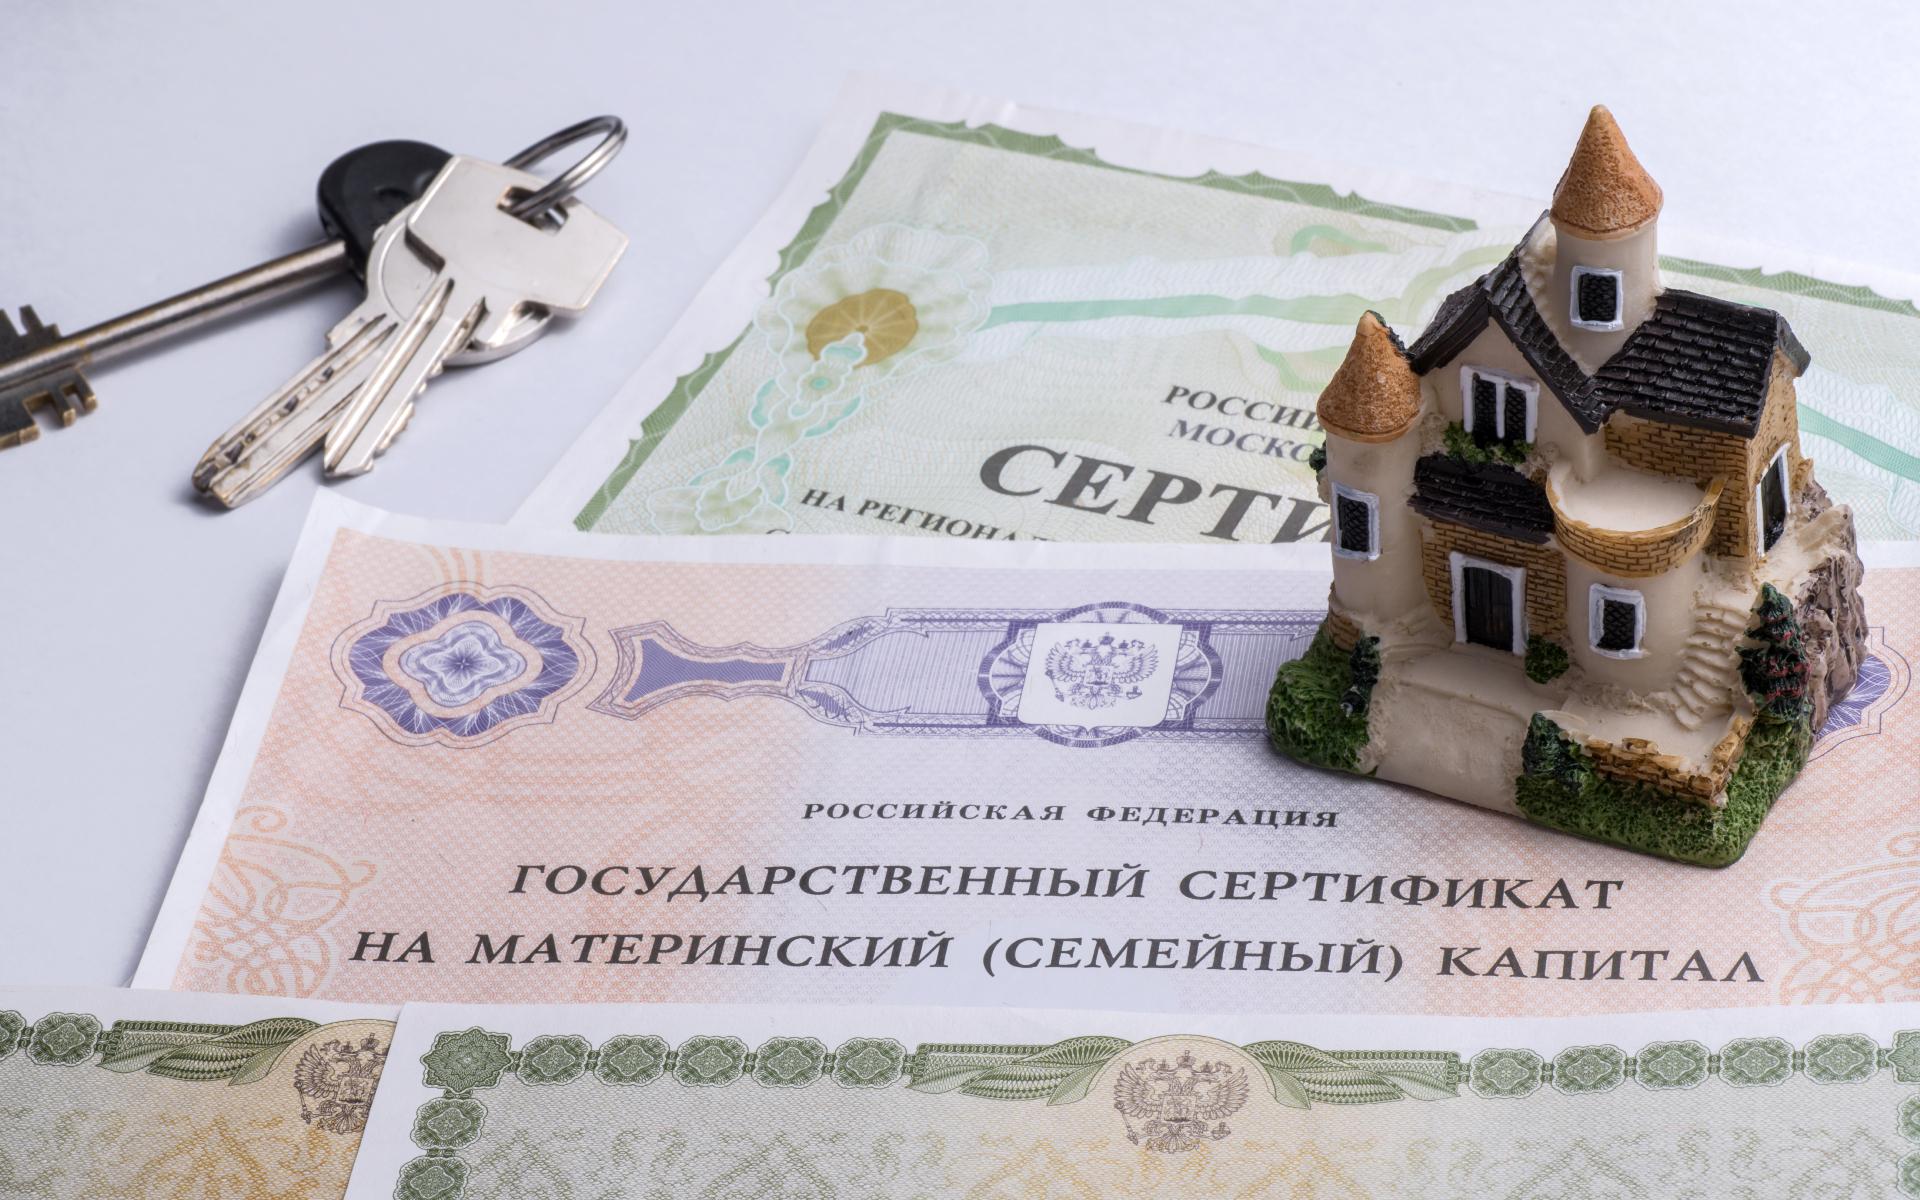 Фото: Shumytskaya Olga\shutterstock